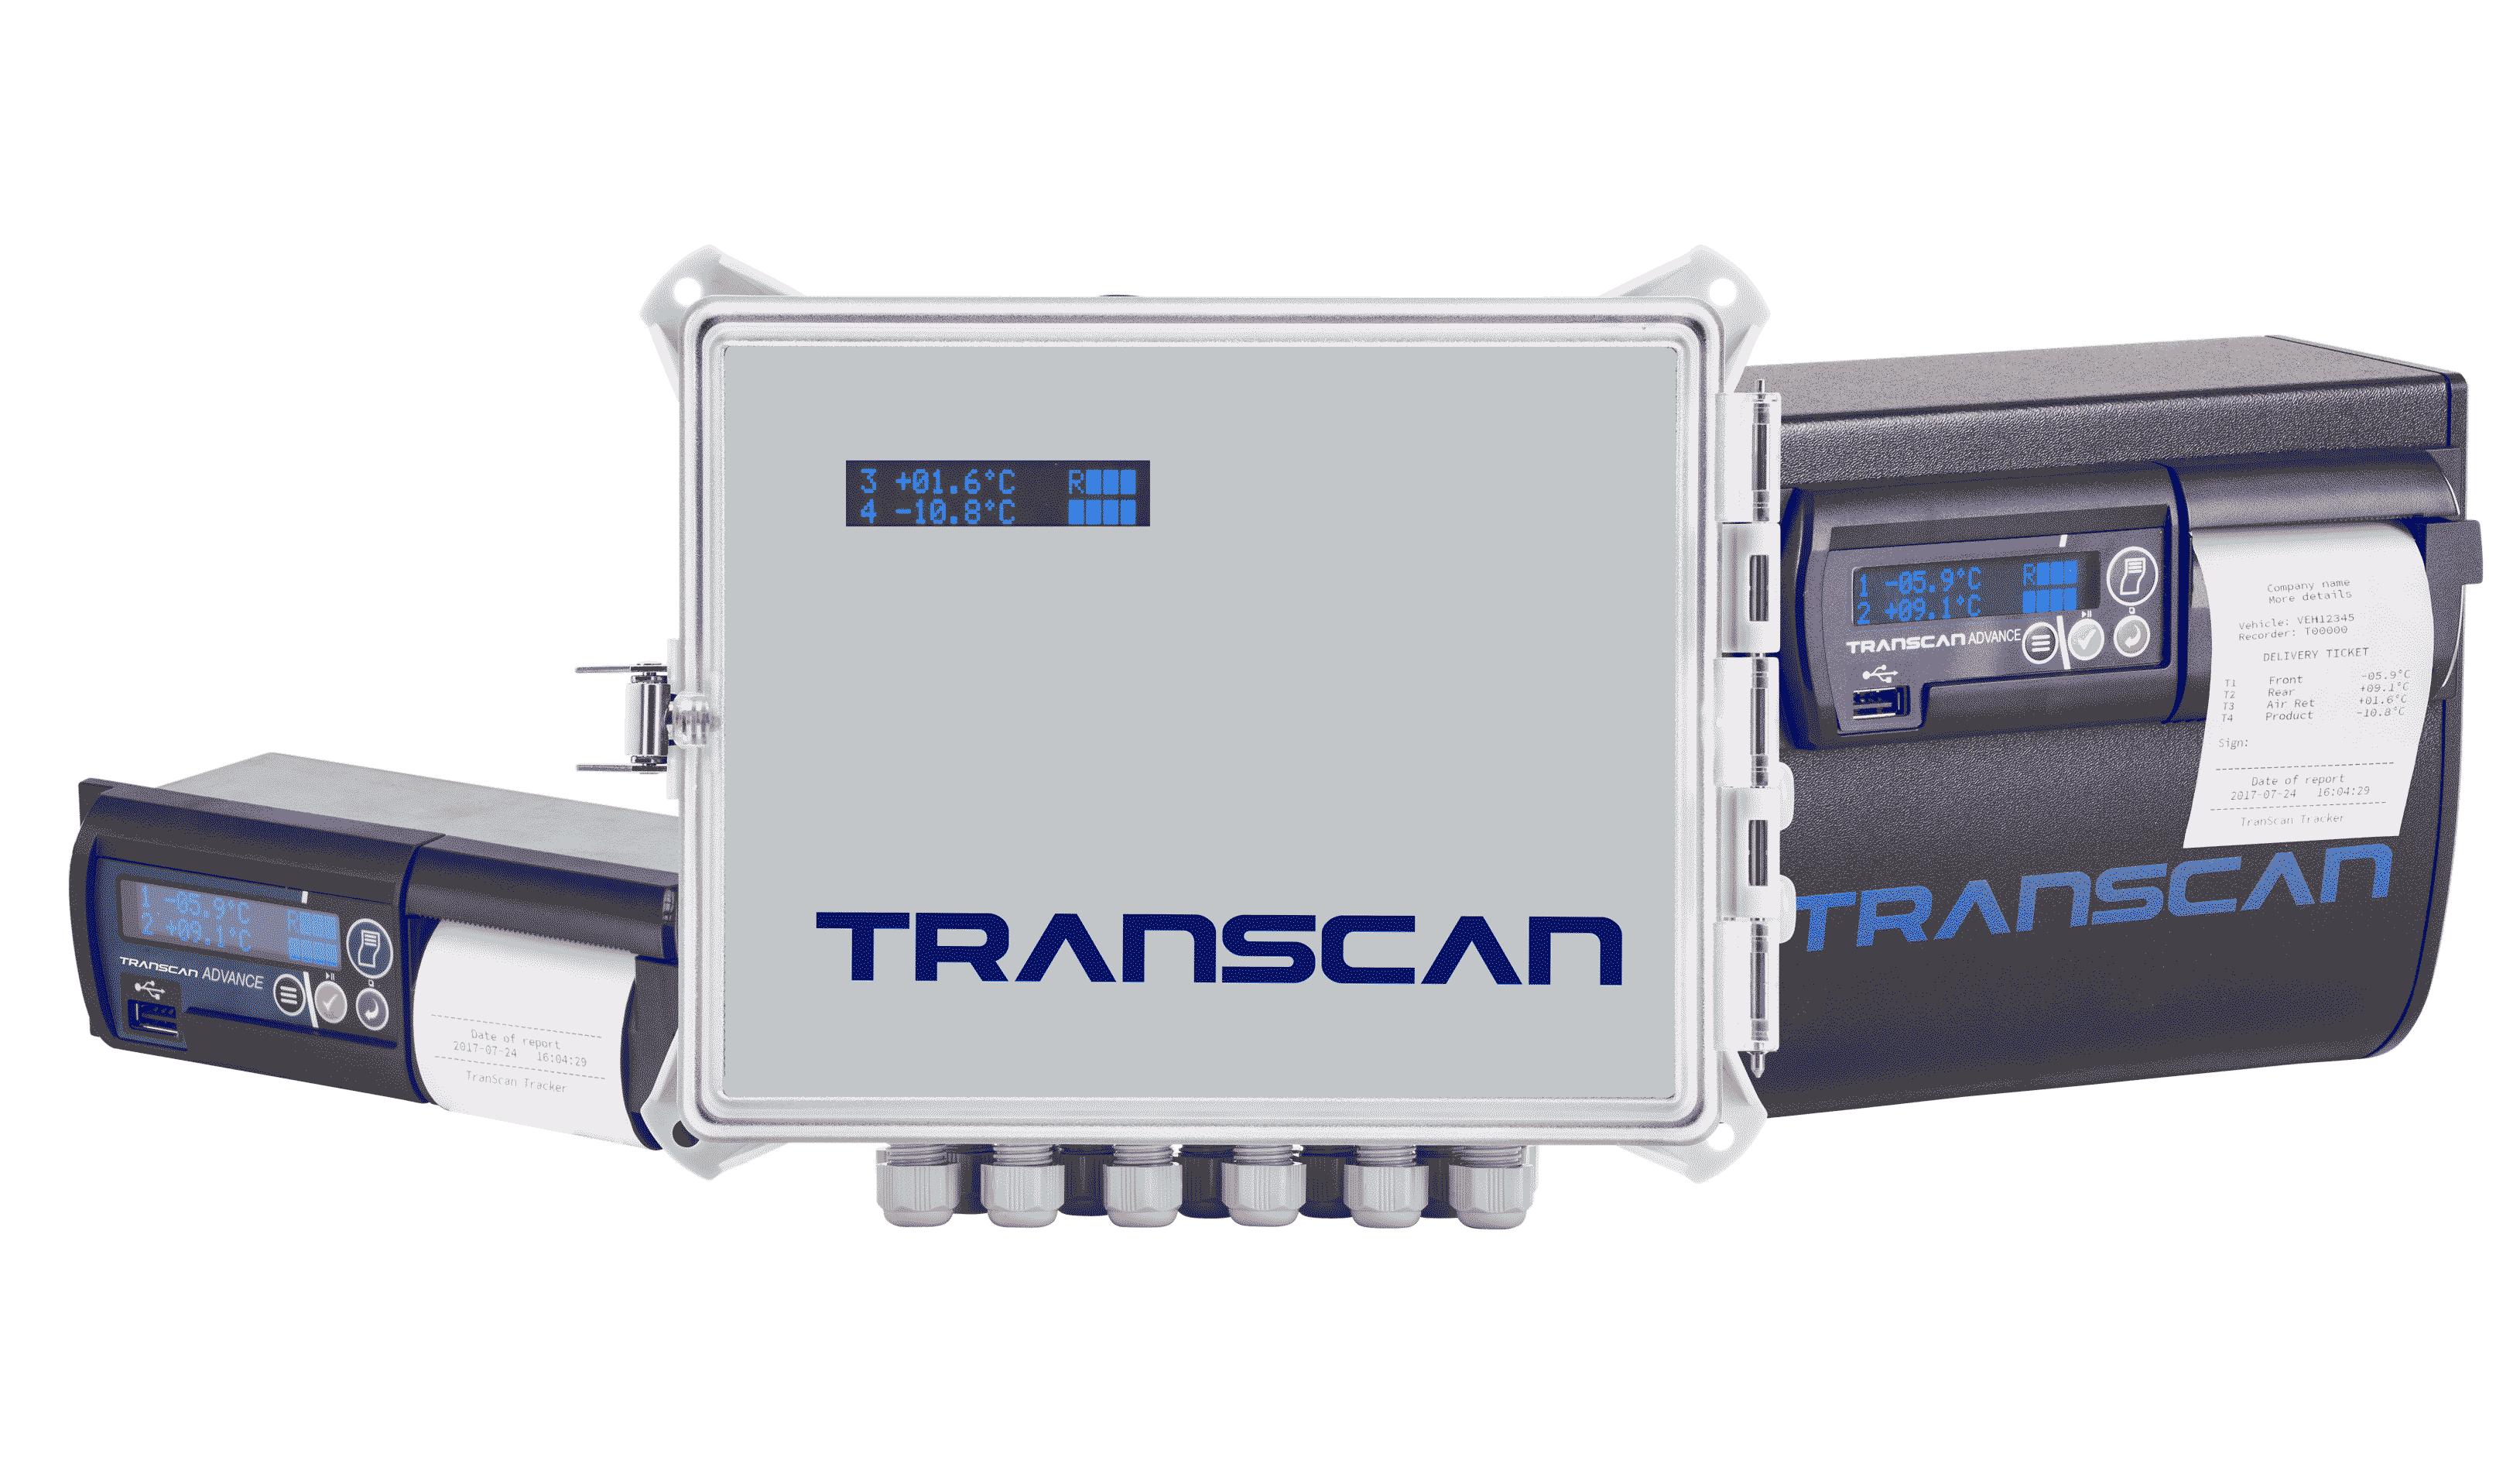 Transcan_Advance_mini2